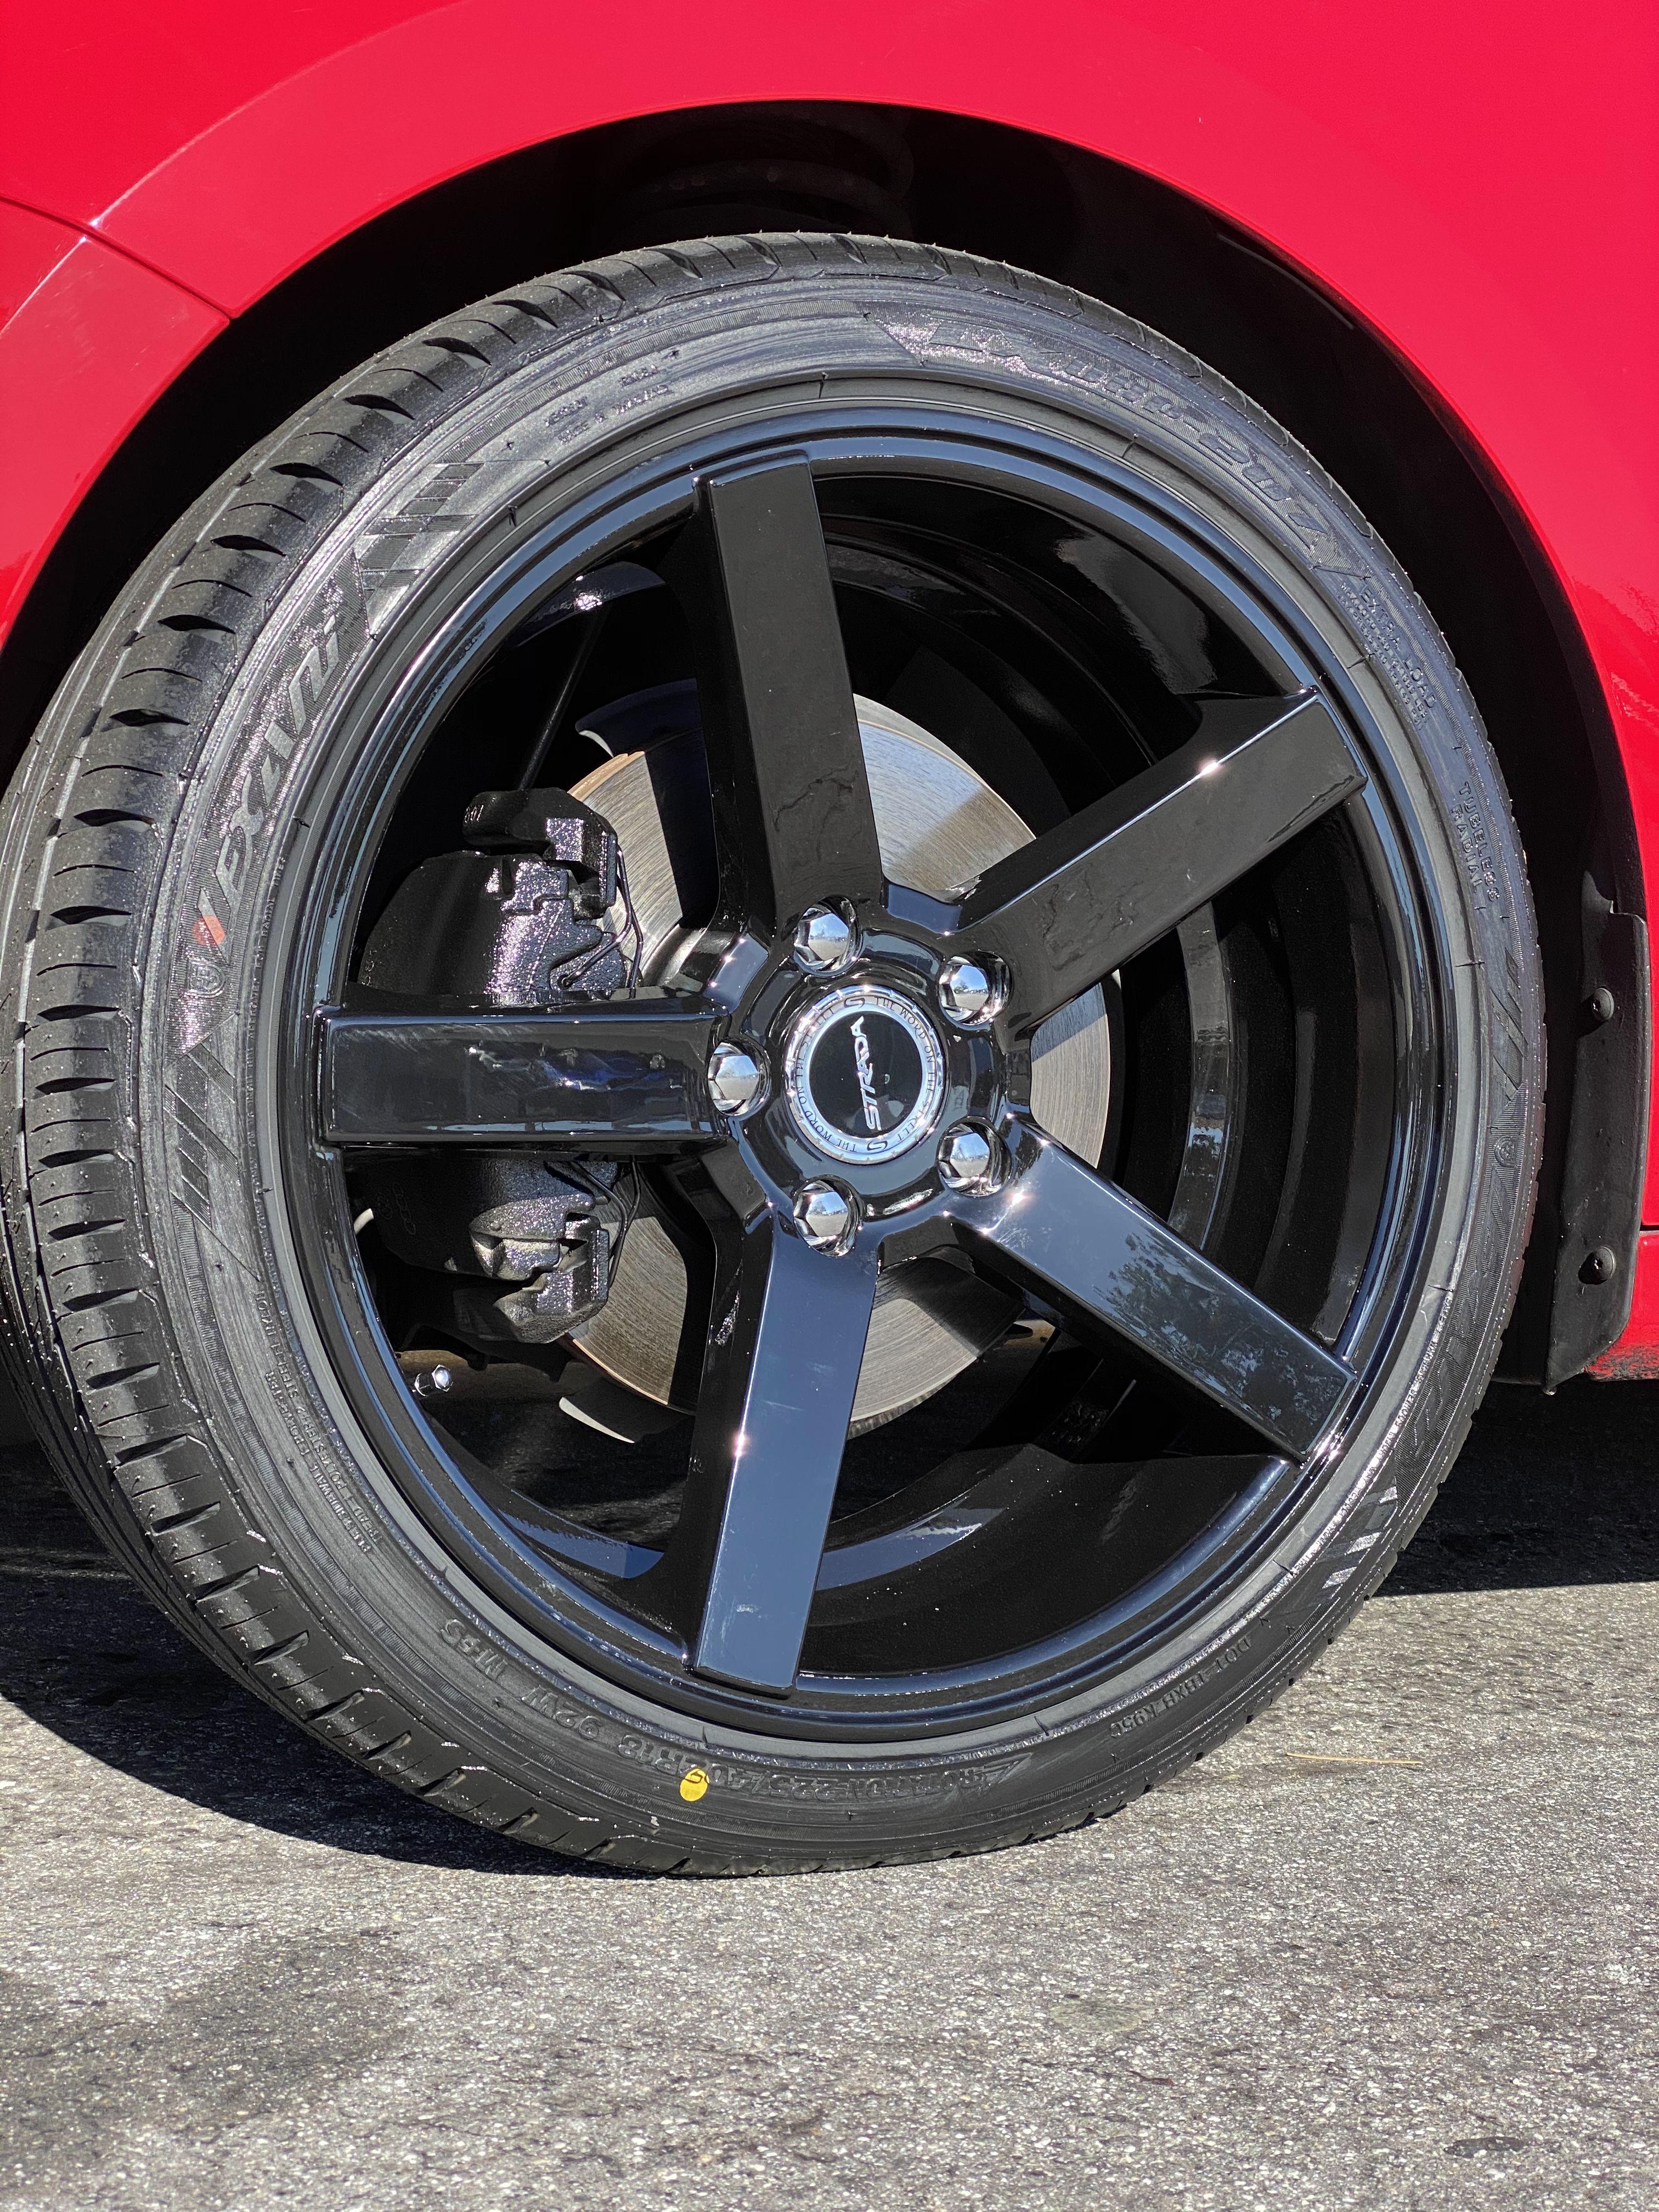 Strada Wheels American Racing Wheels Niche Wheels Wheel